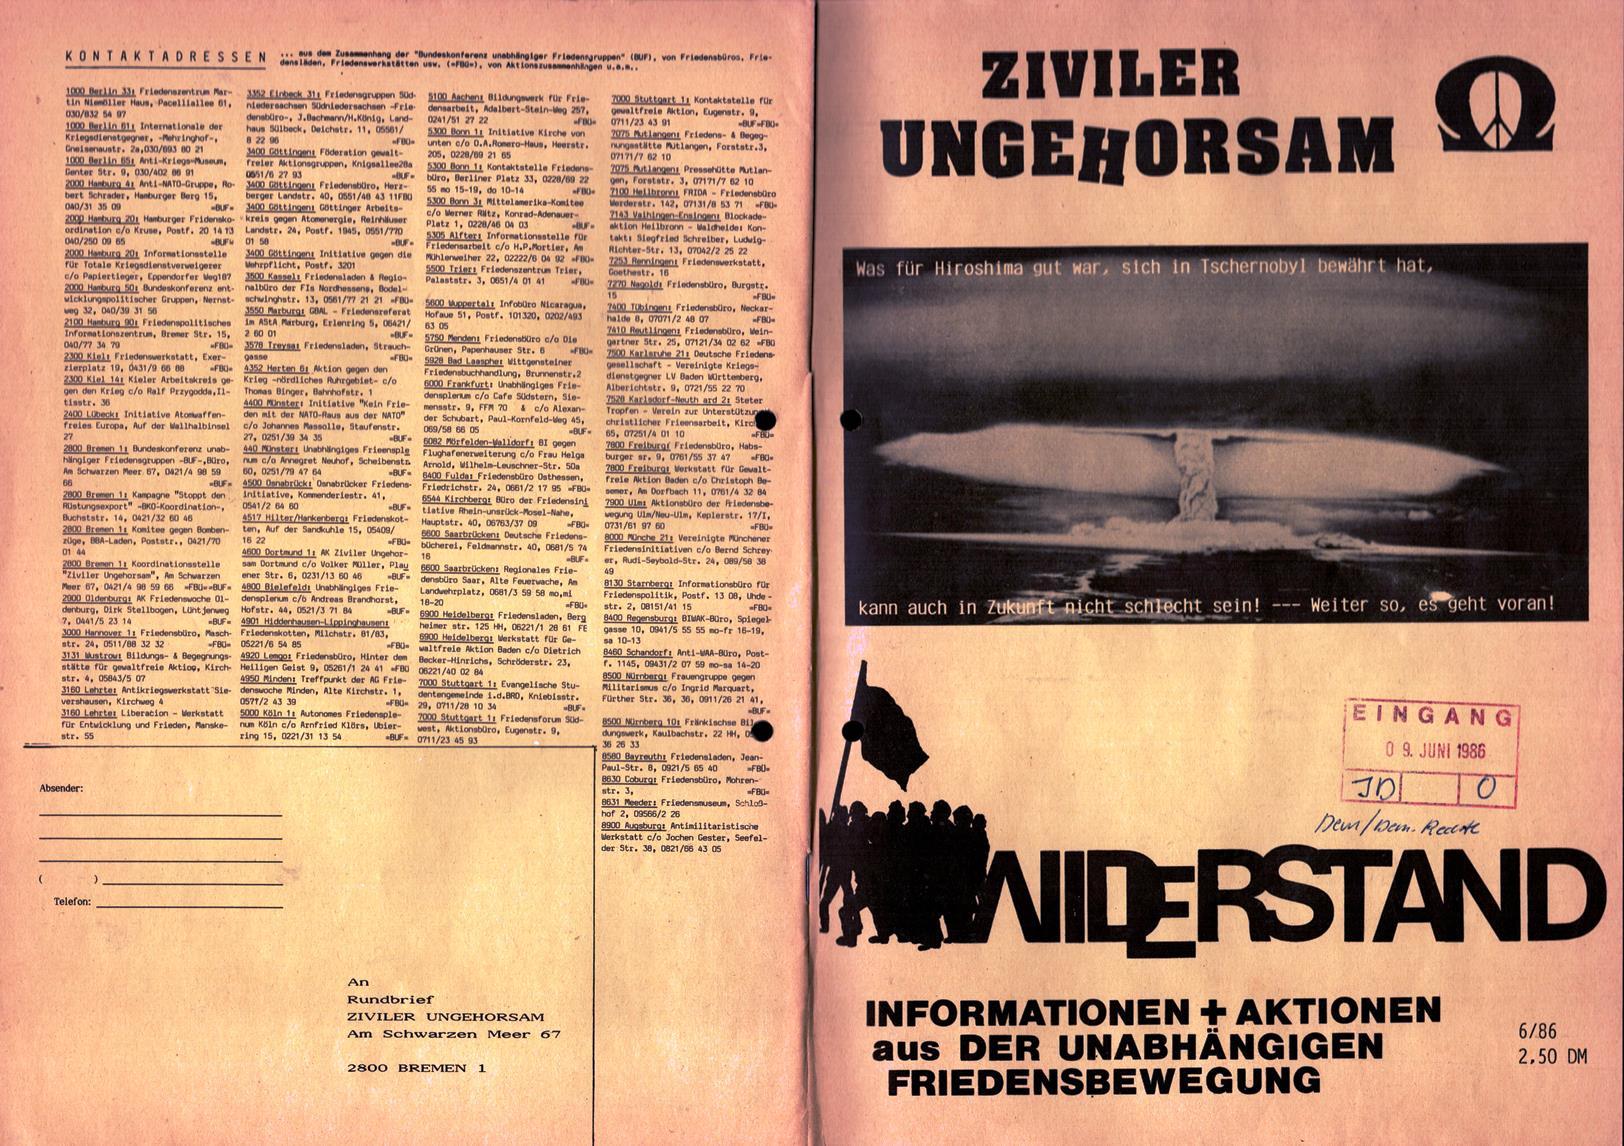 Ziviler_Ungehorsam_1986_006_001